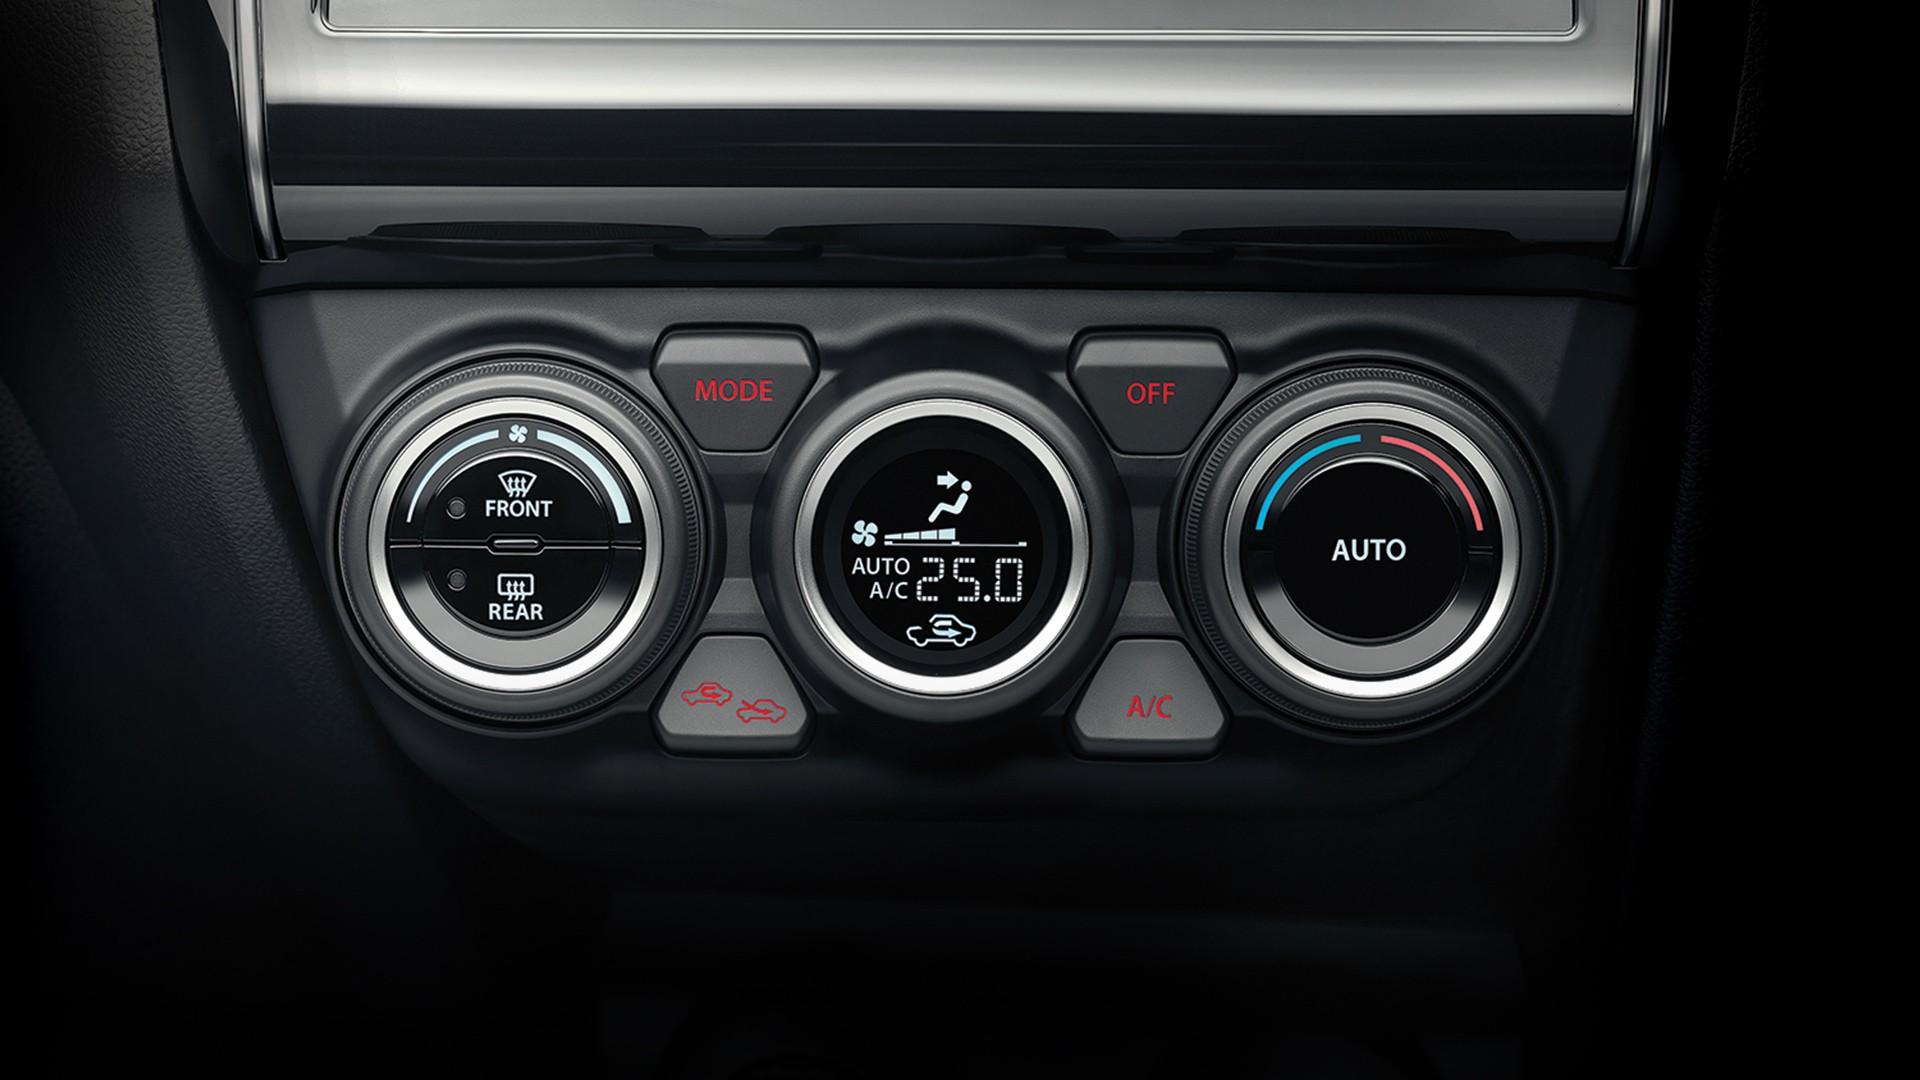 New Suzuki Swift ระบบปรับอากาศอัตโนมัติ